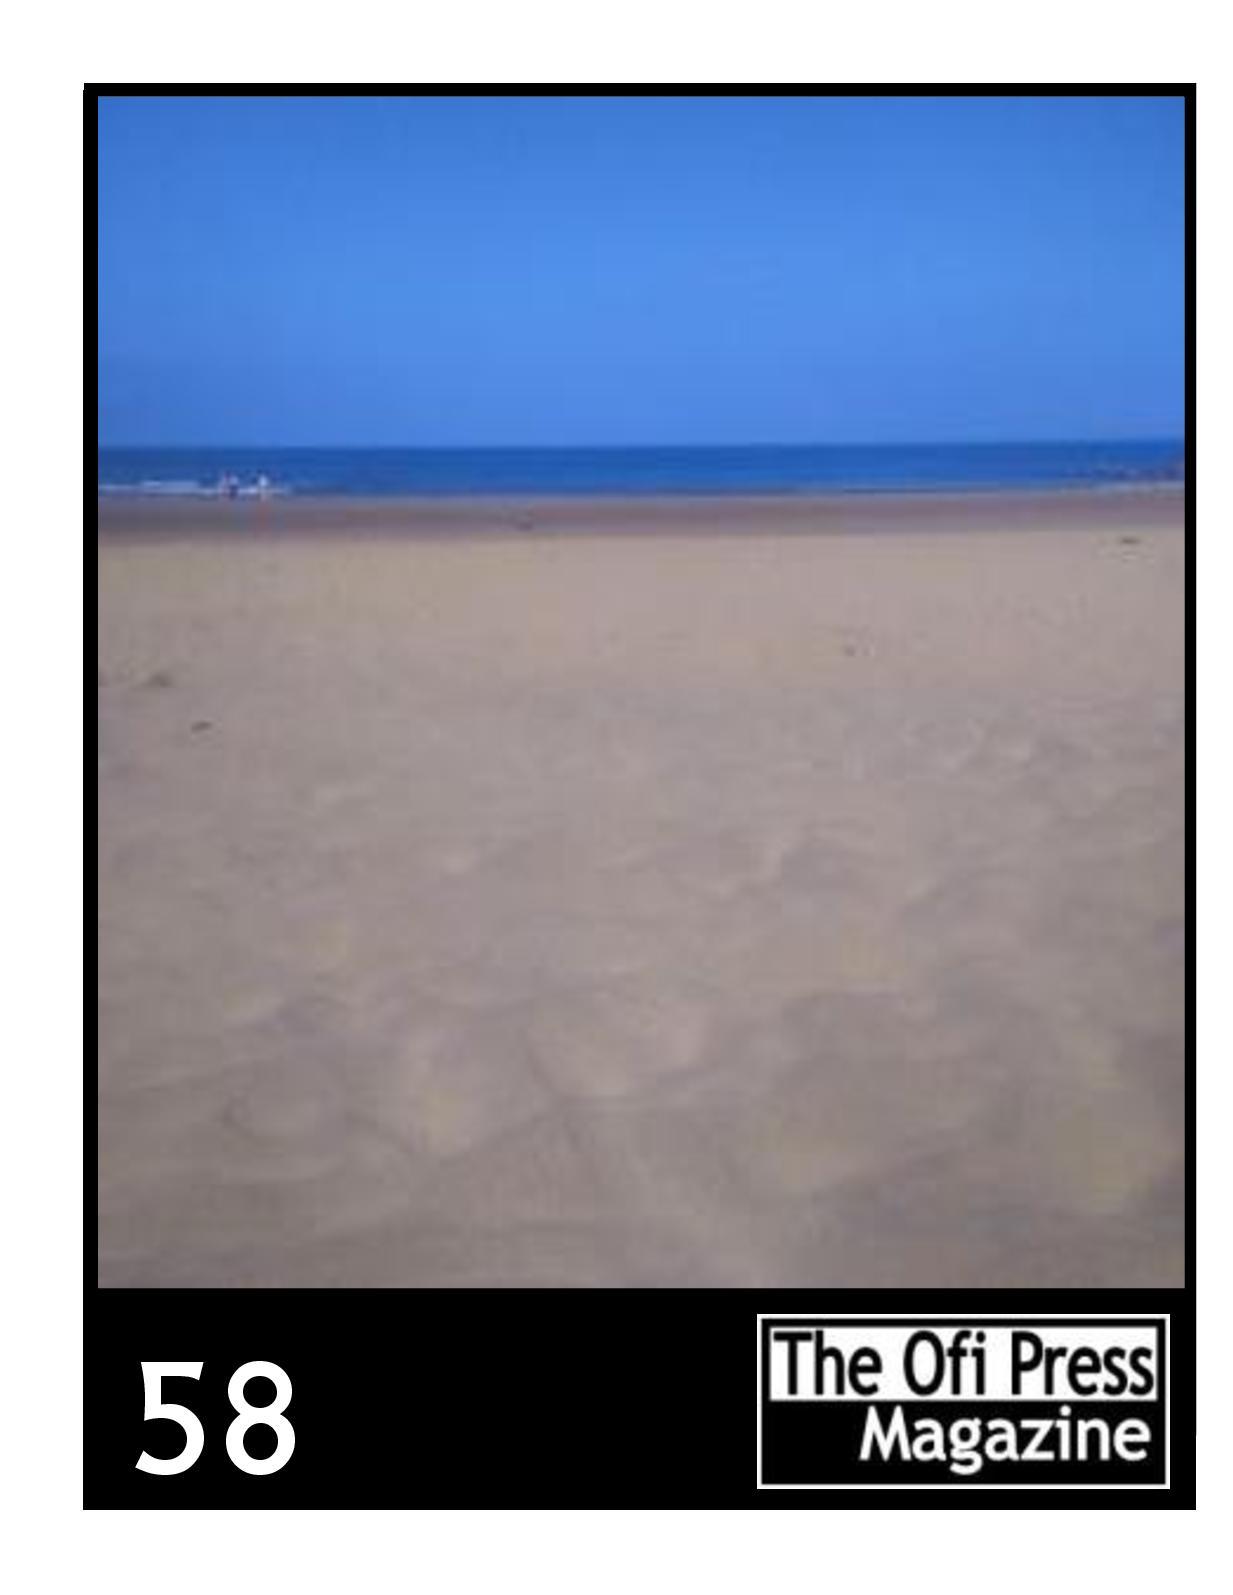 a03a7b19c39 Calaméo - Ofi Press Issue 58